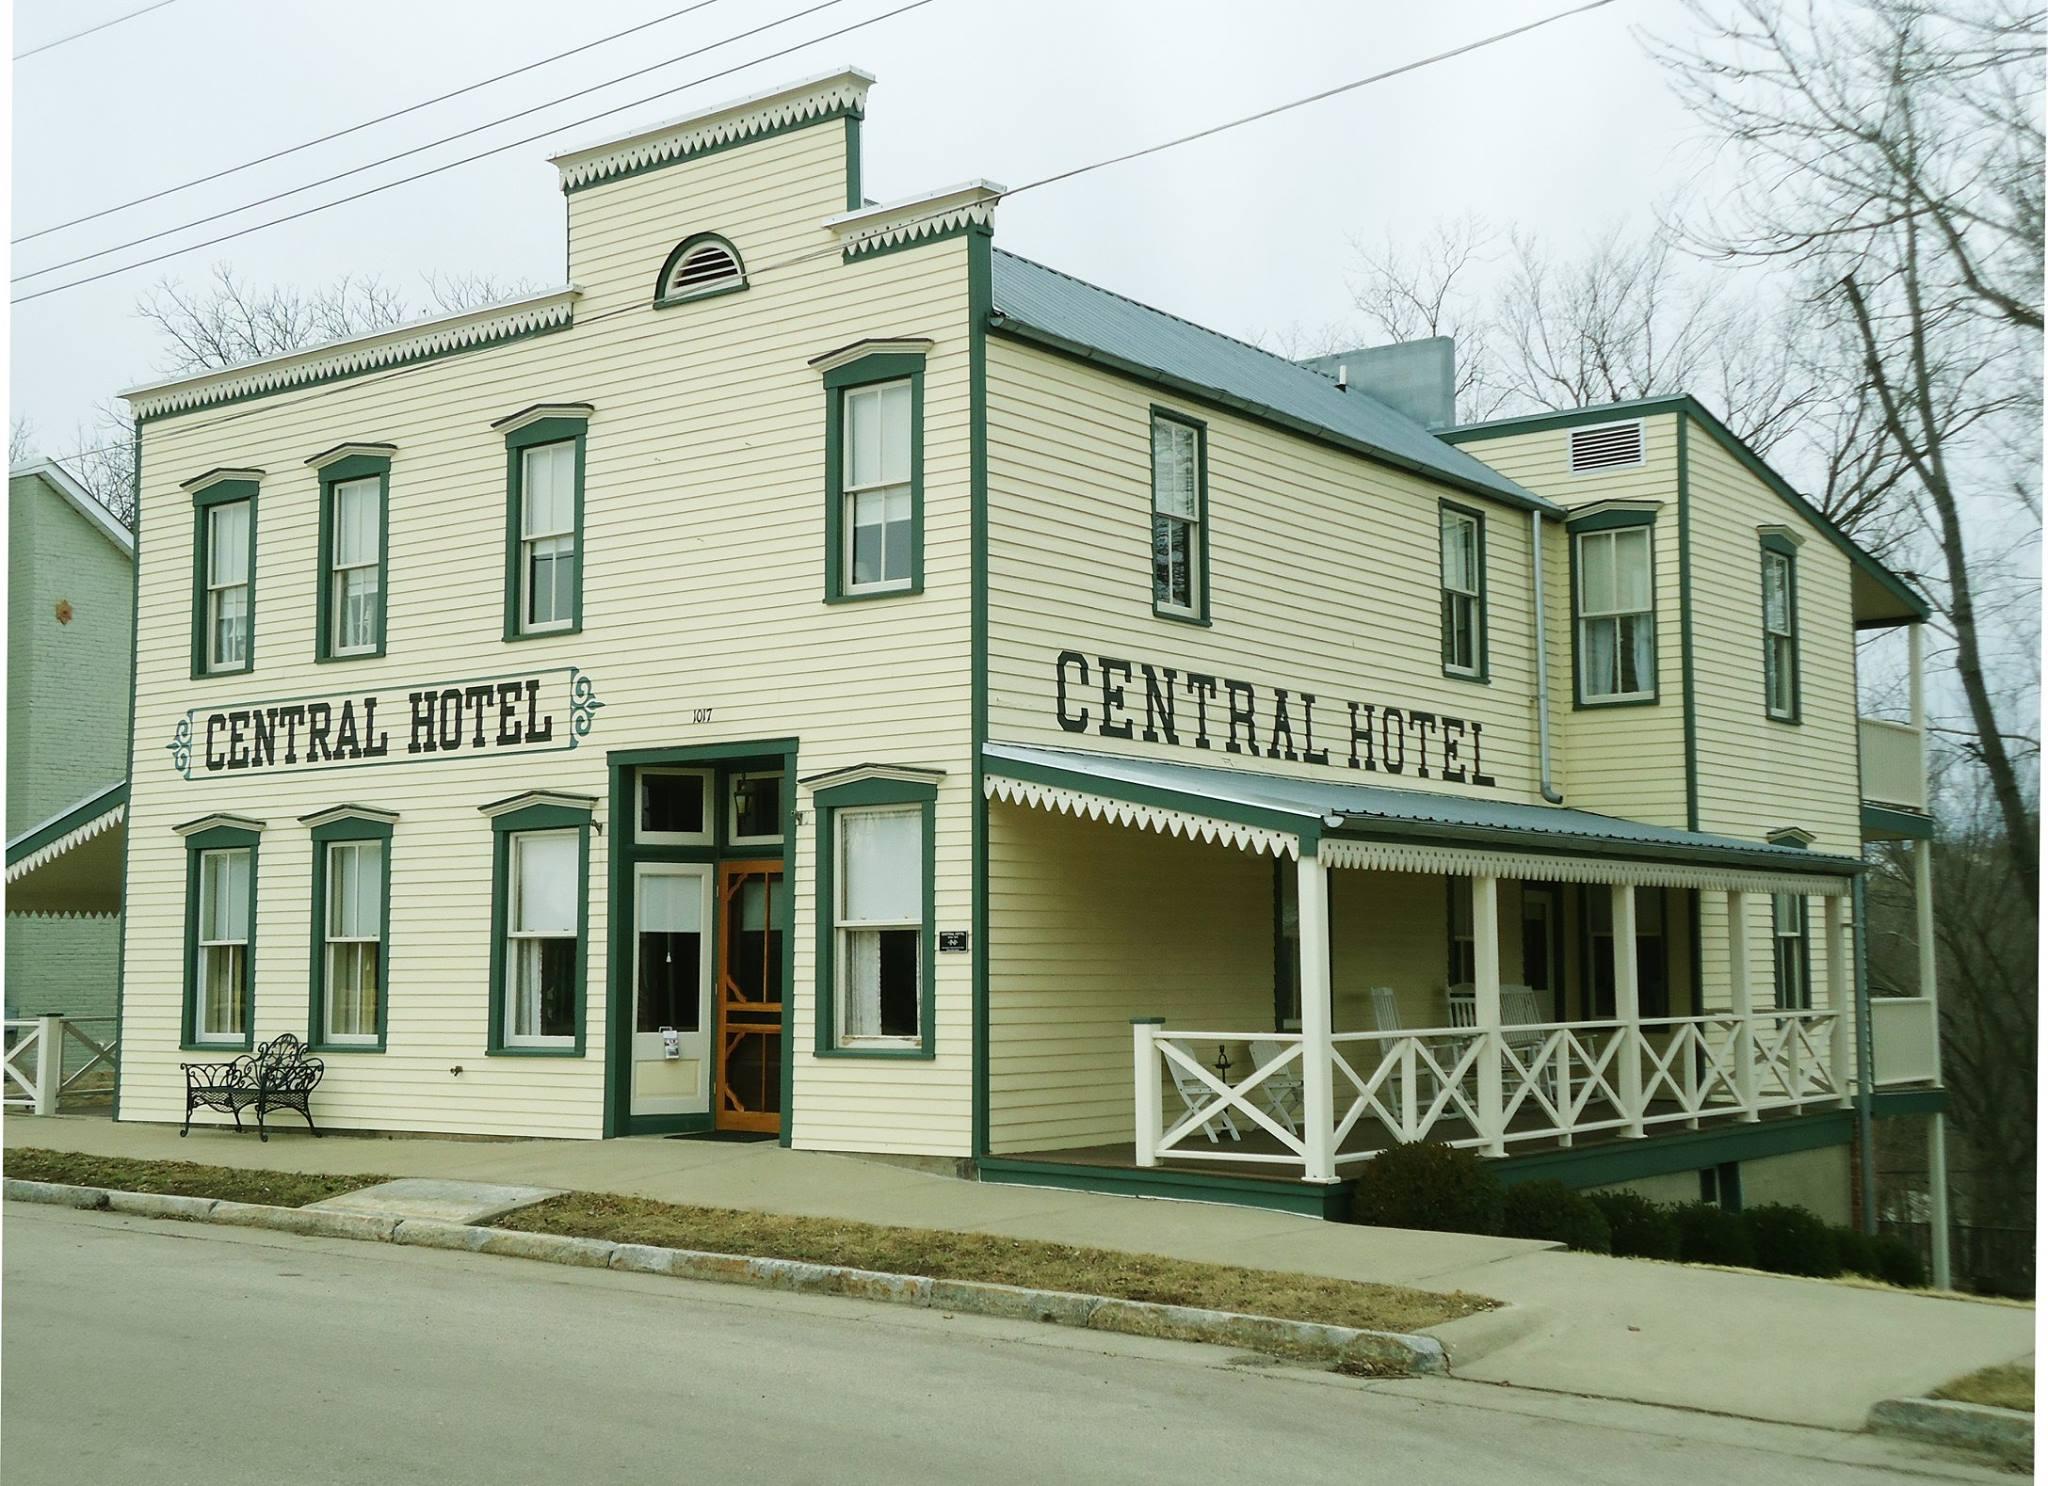 Central Hotel.jpg